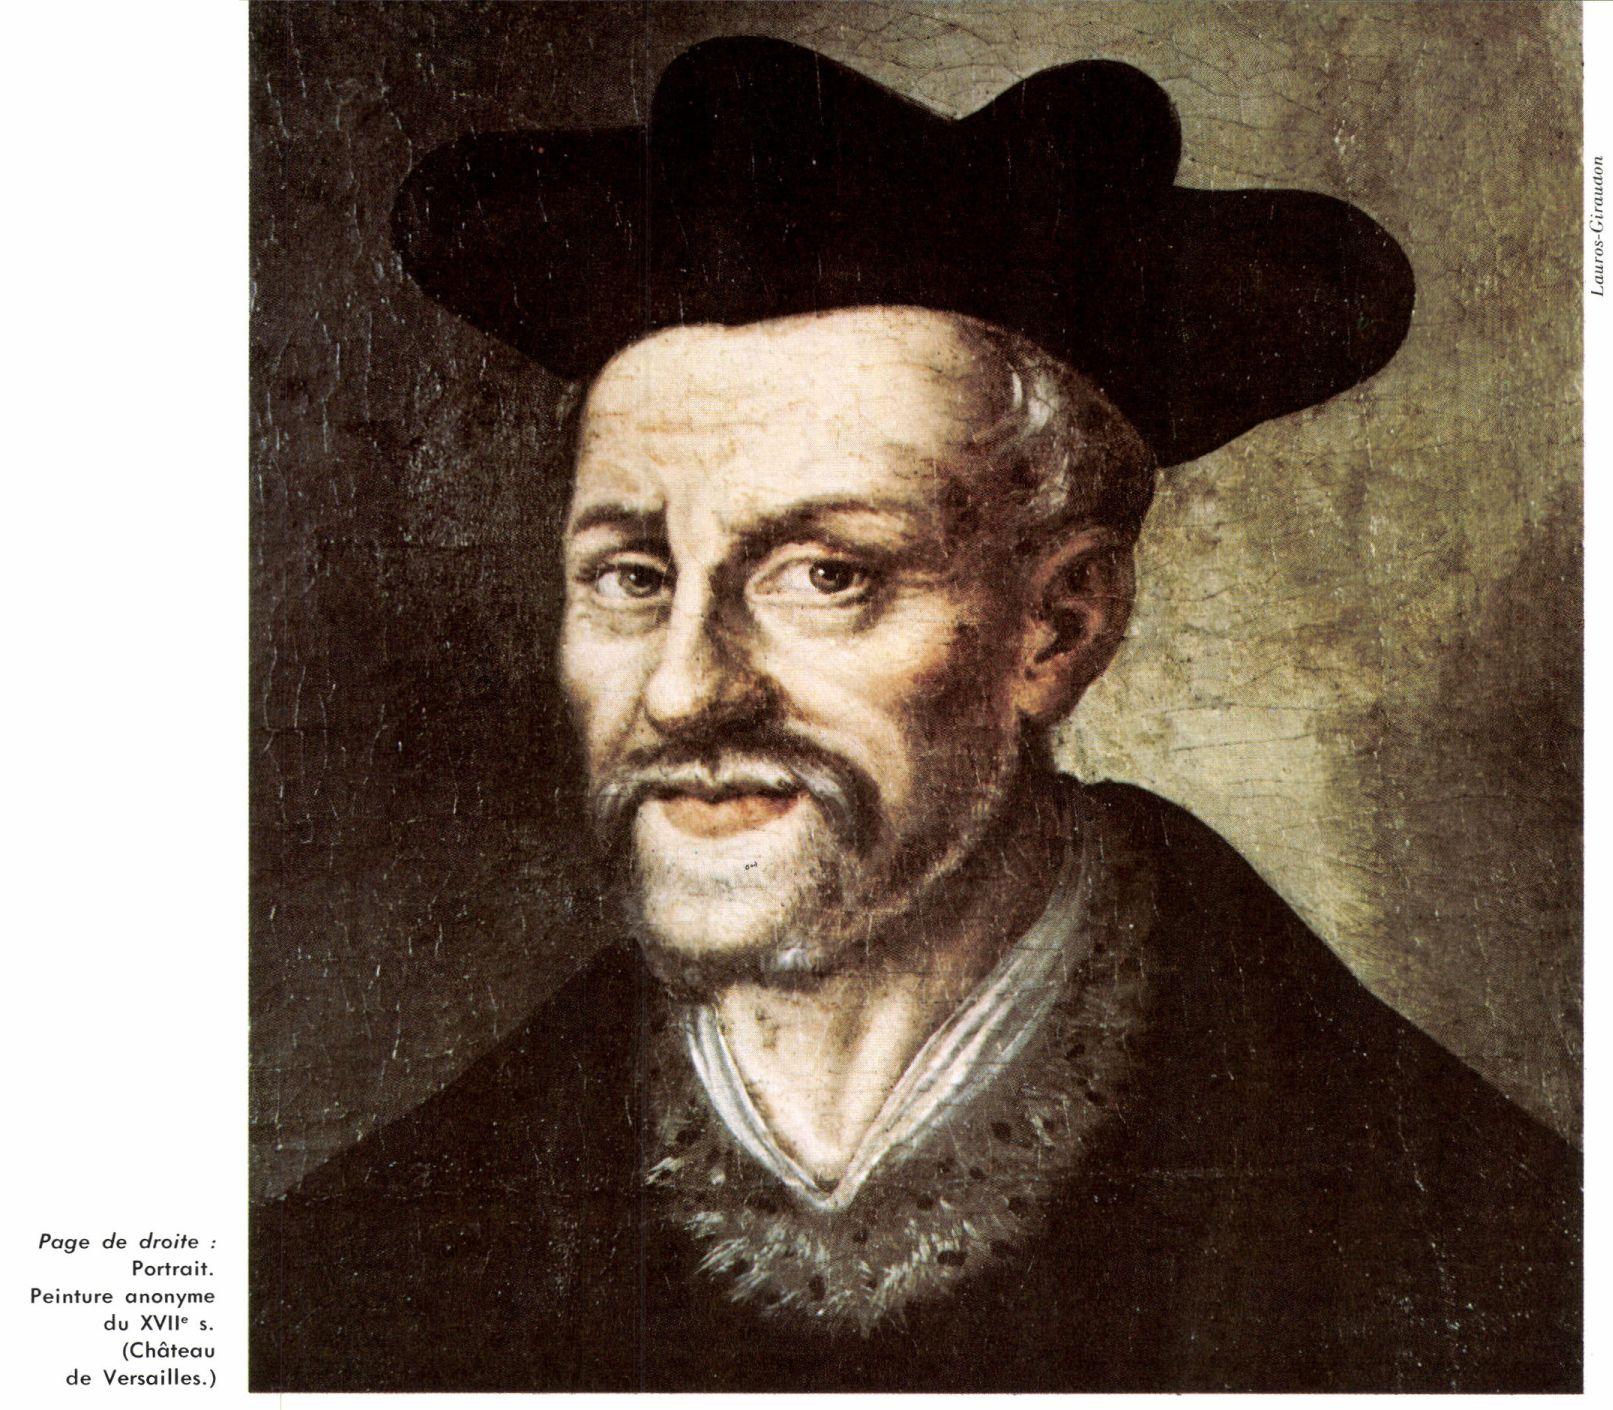 françois rabelais pantagruel 1532